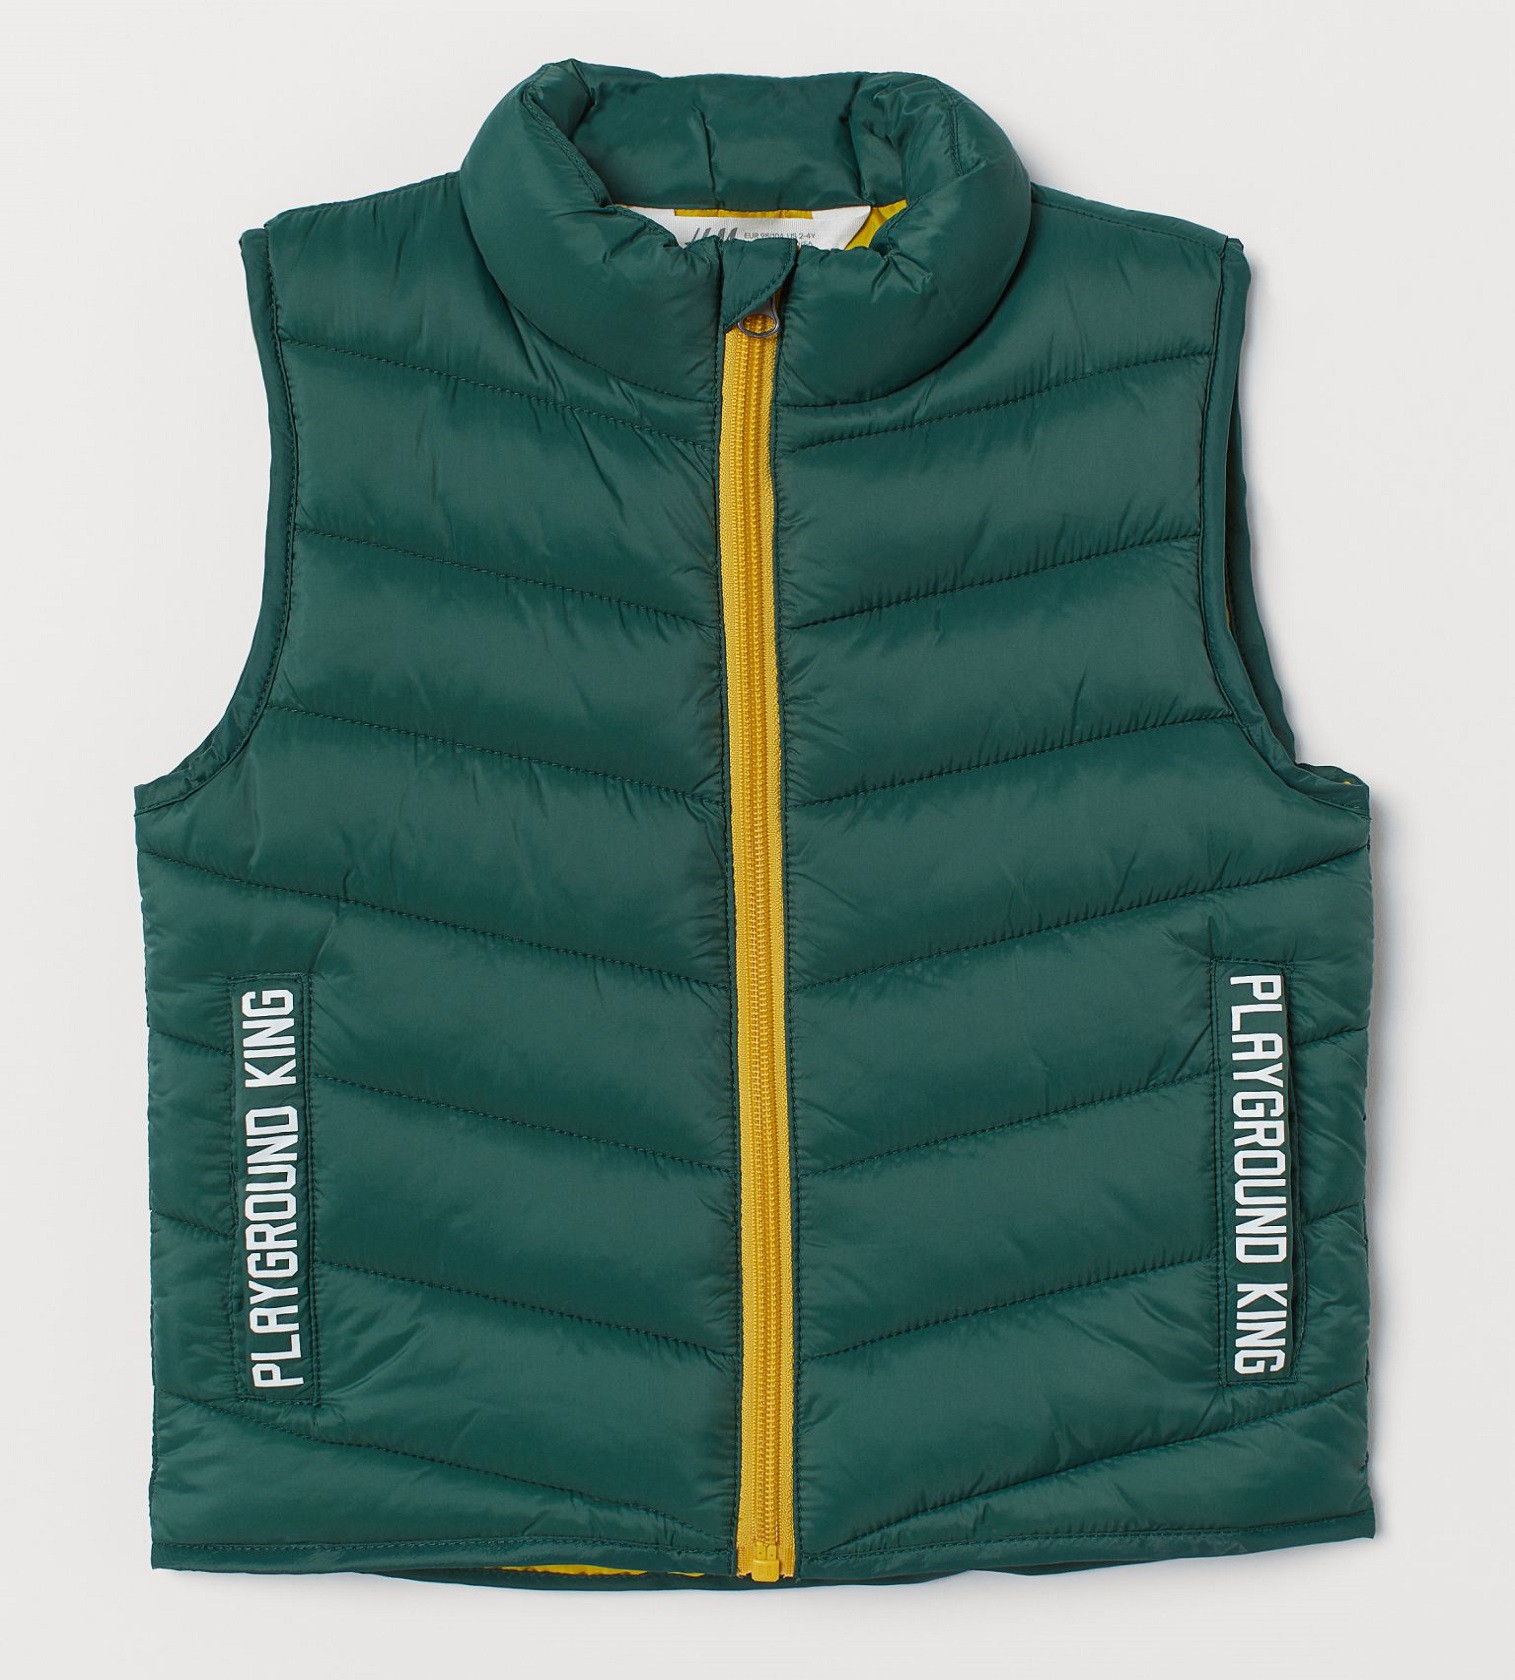 Купити Жилетка H&M Темно-зелена - фото 1